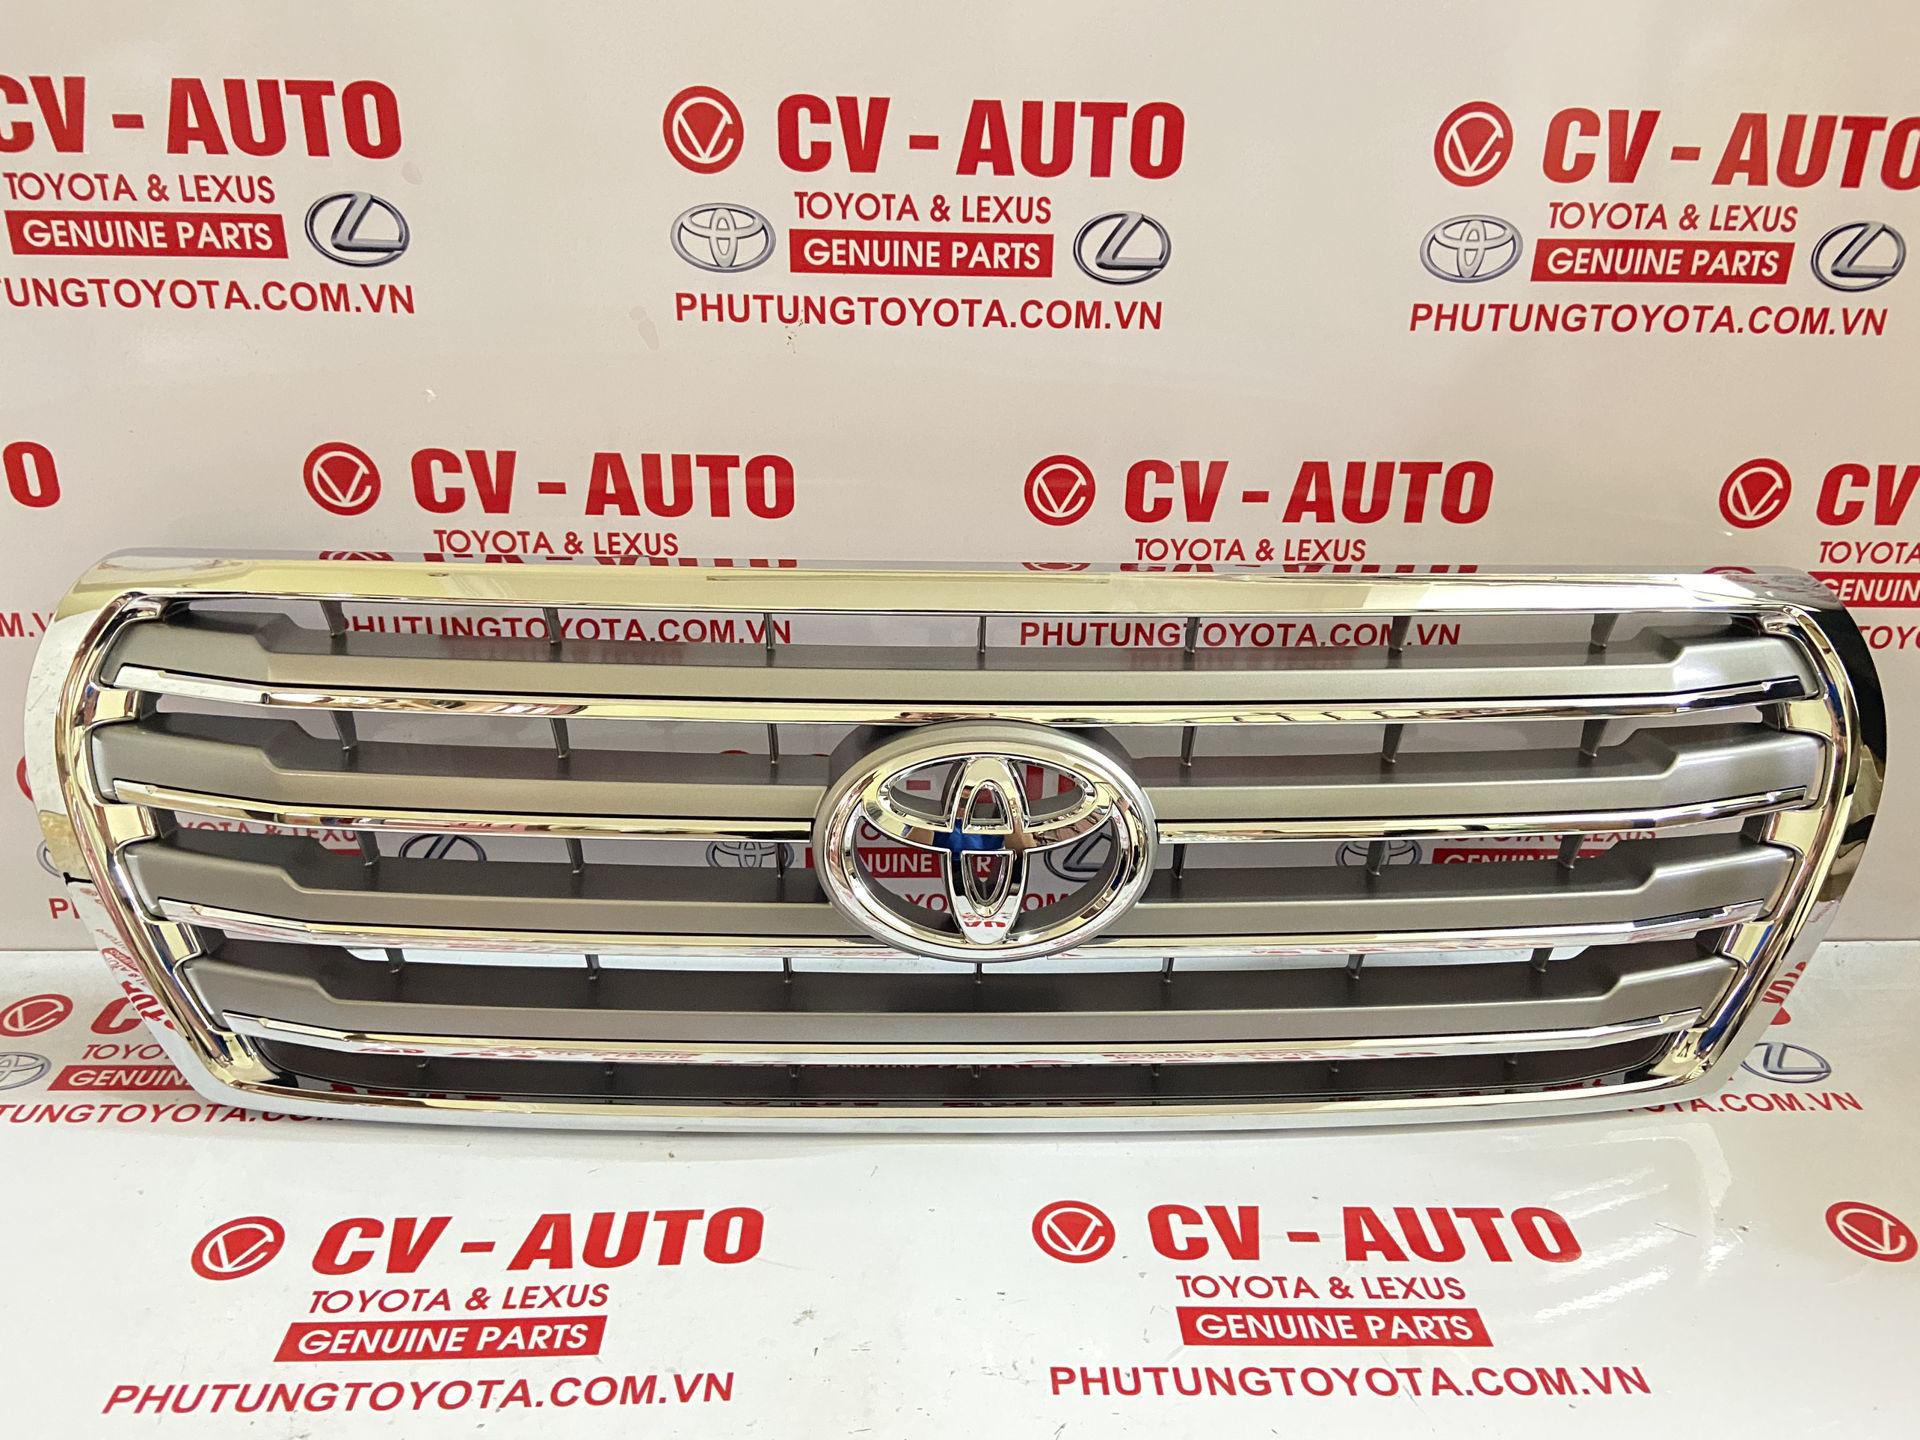 Picture of 53101-60880 Mặt ca lăng Toyota Land Cruiser Prado 2013-2015